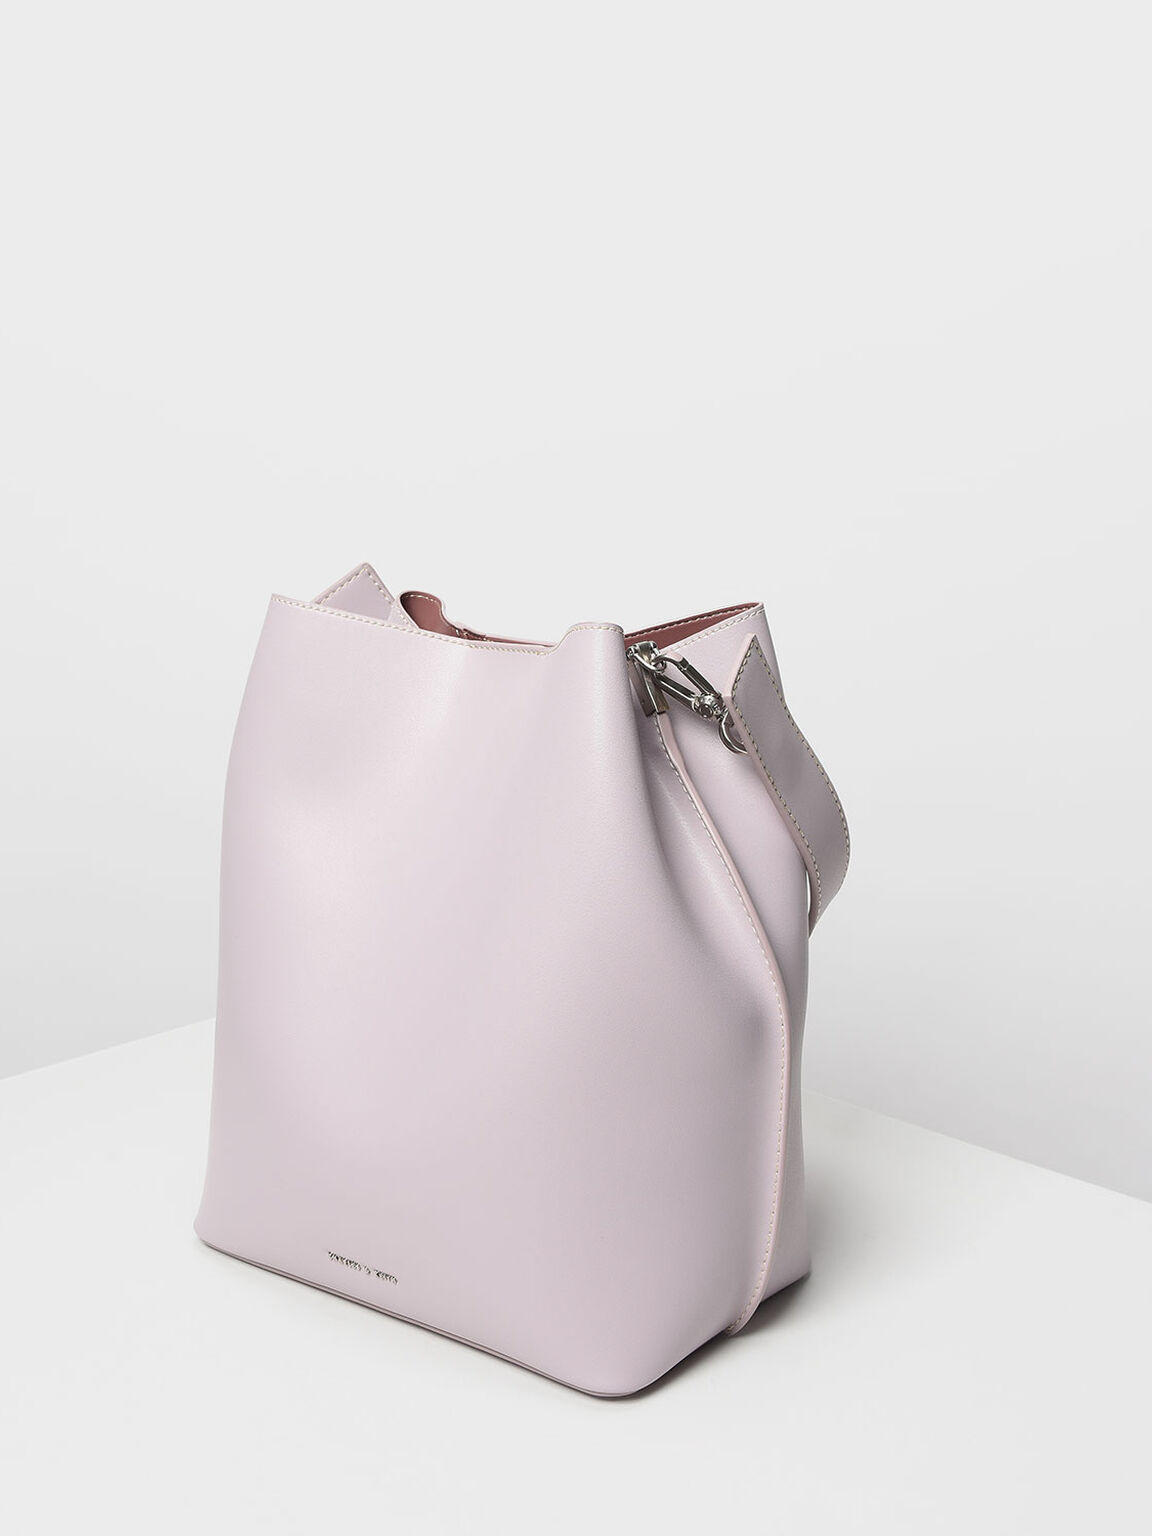 Stud Detail Hobo Bag, Lilac, hi-res